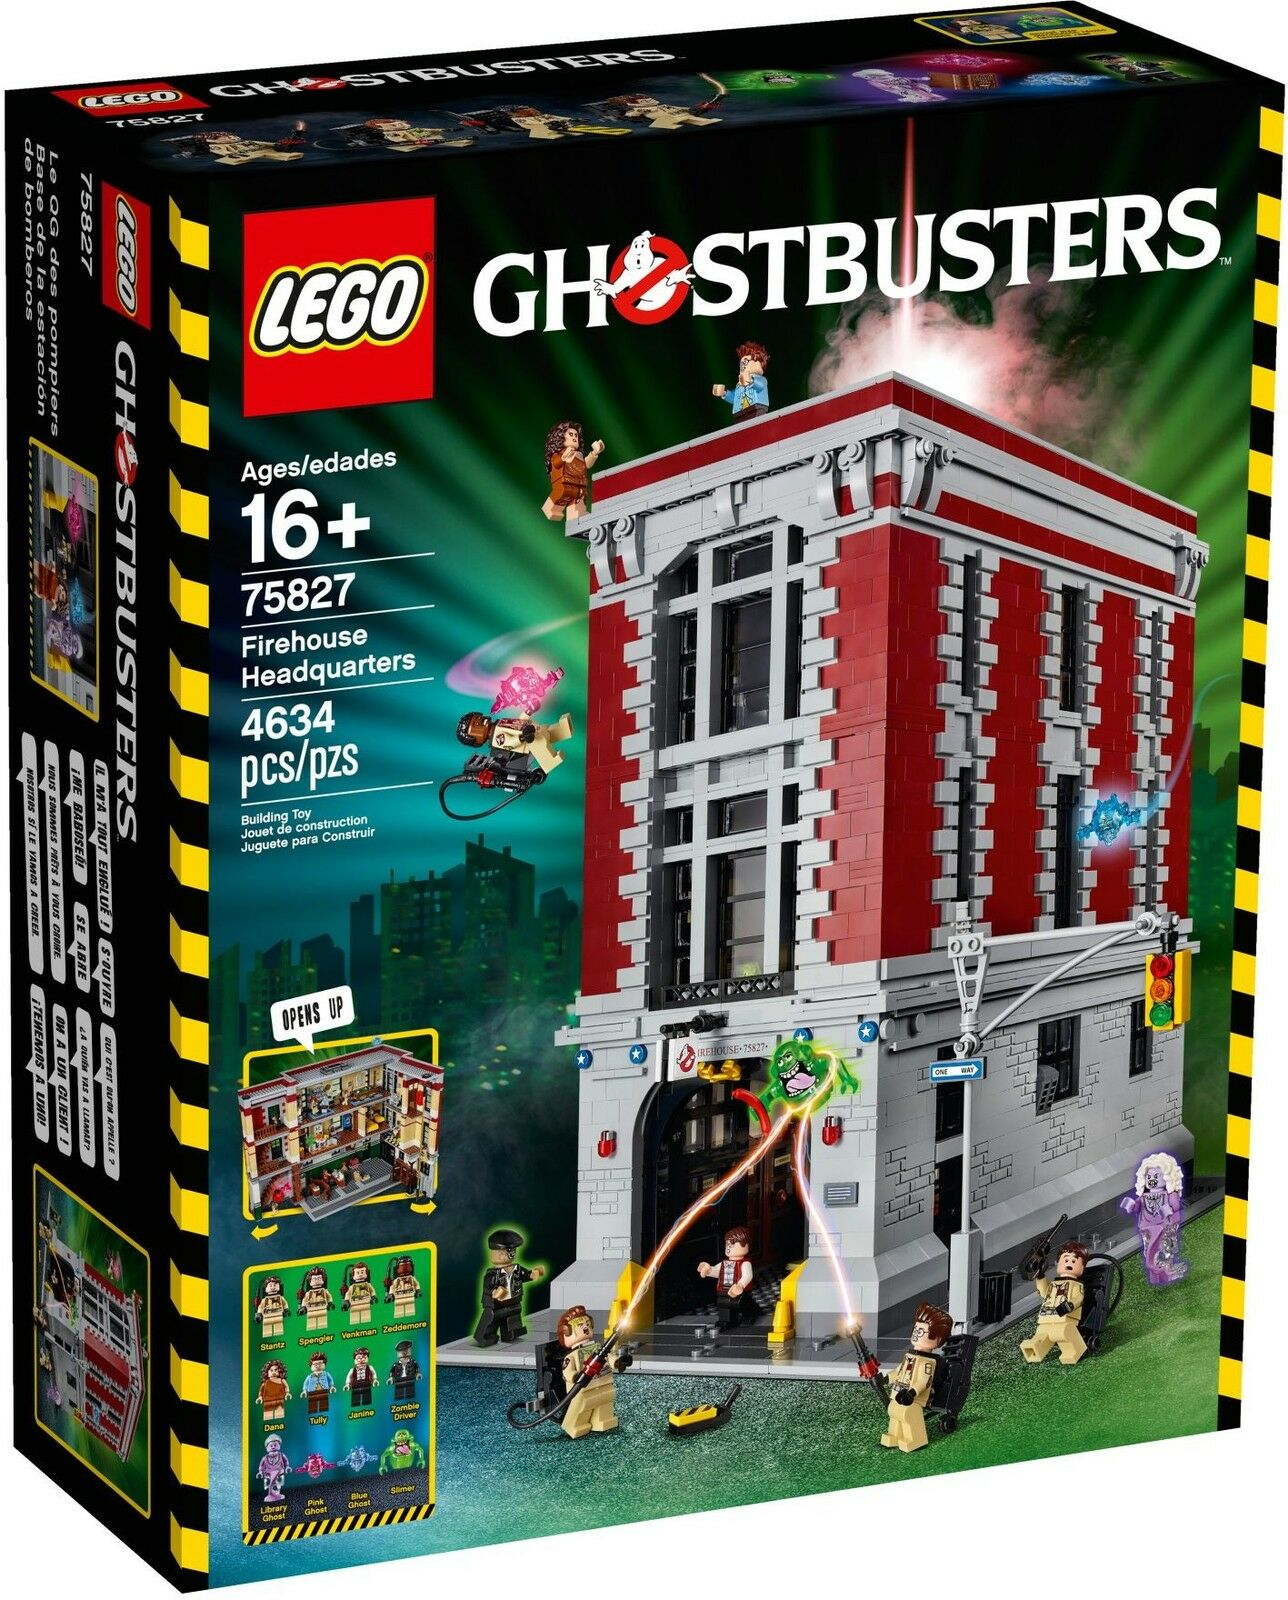 LEGO® Ghostbusters™ Firehouse 75827 Feuerwehr-Hauptquartier Firehouse Ghostbusters™ NEU (75828) a6f4d6